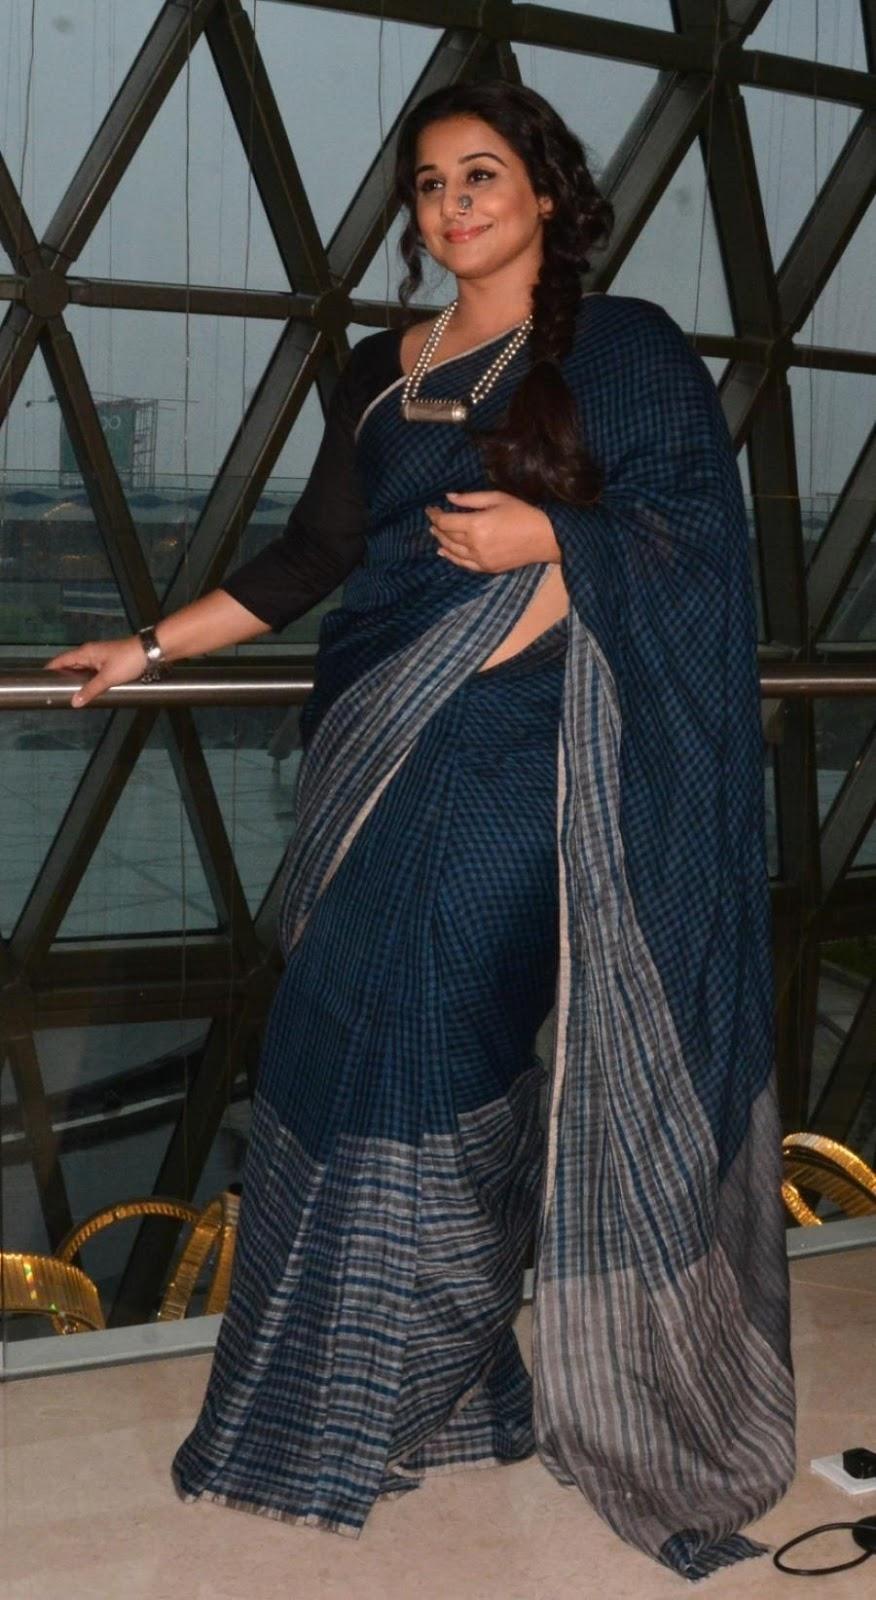 Vidya Balan Stills In Blue Saree At New Film Promotion